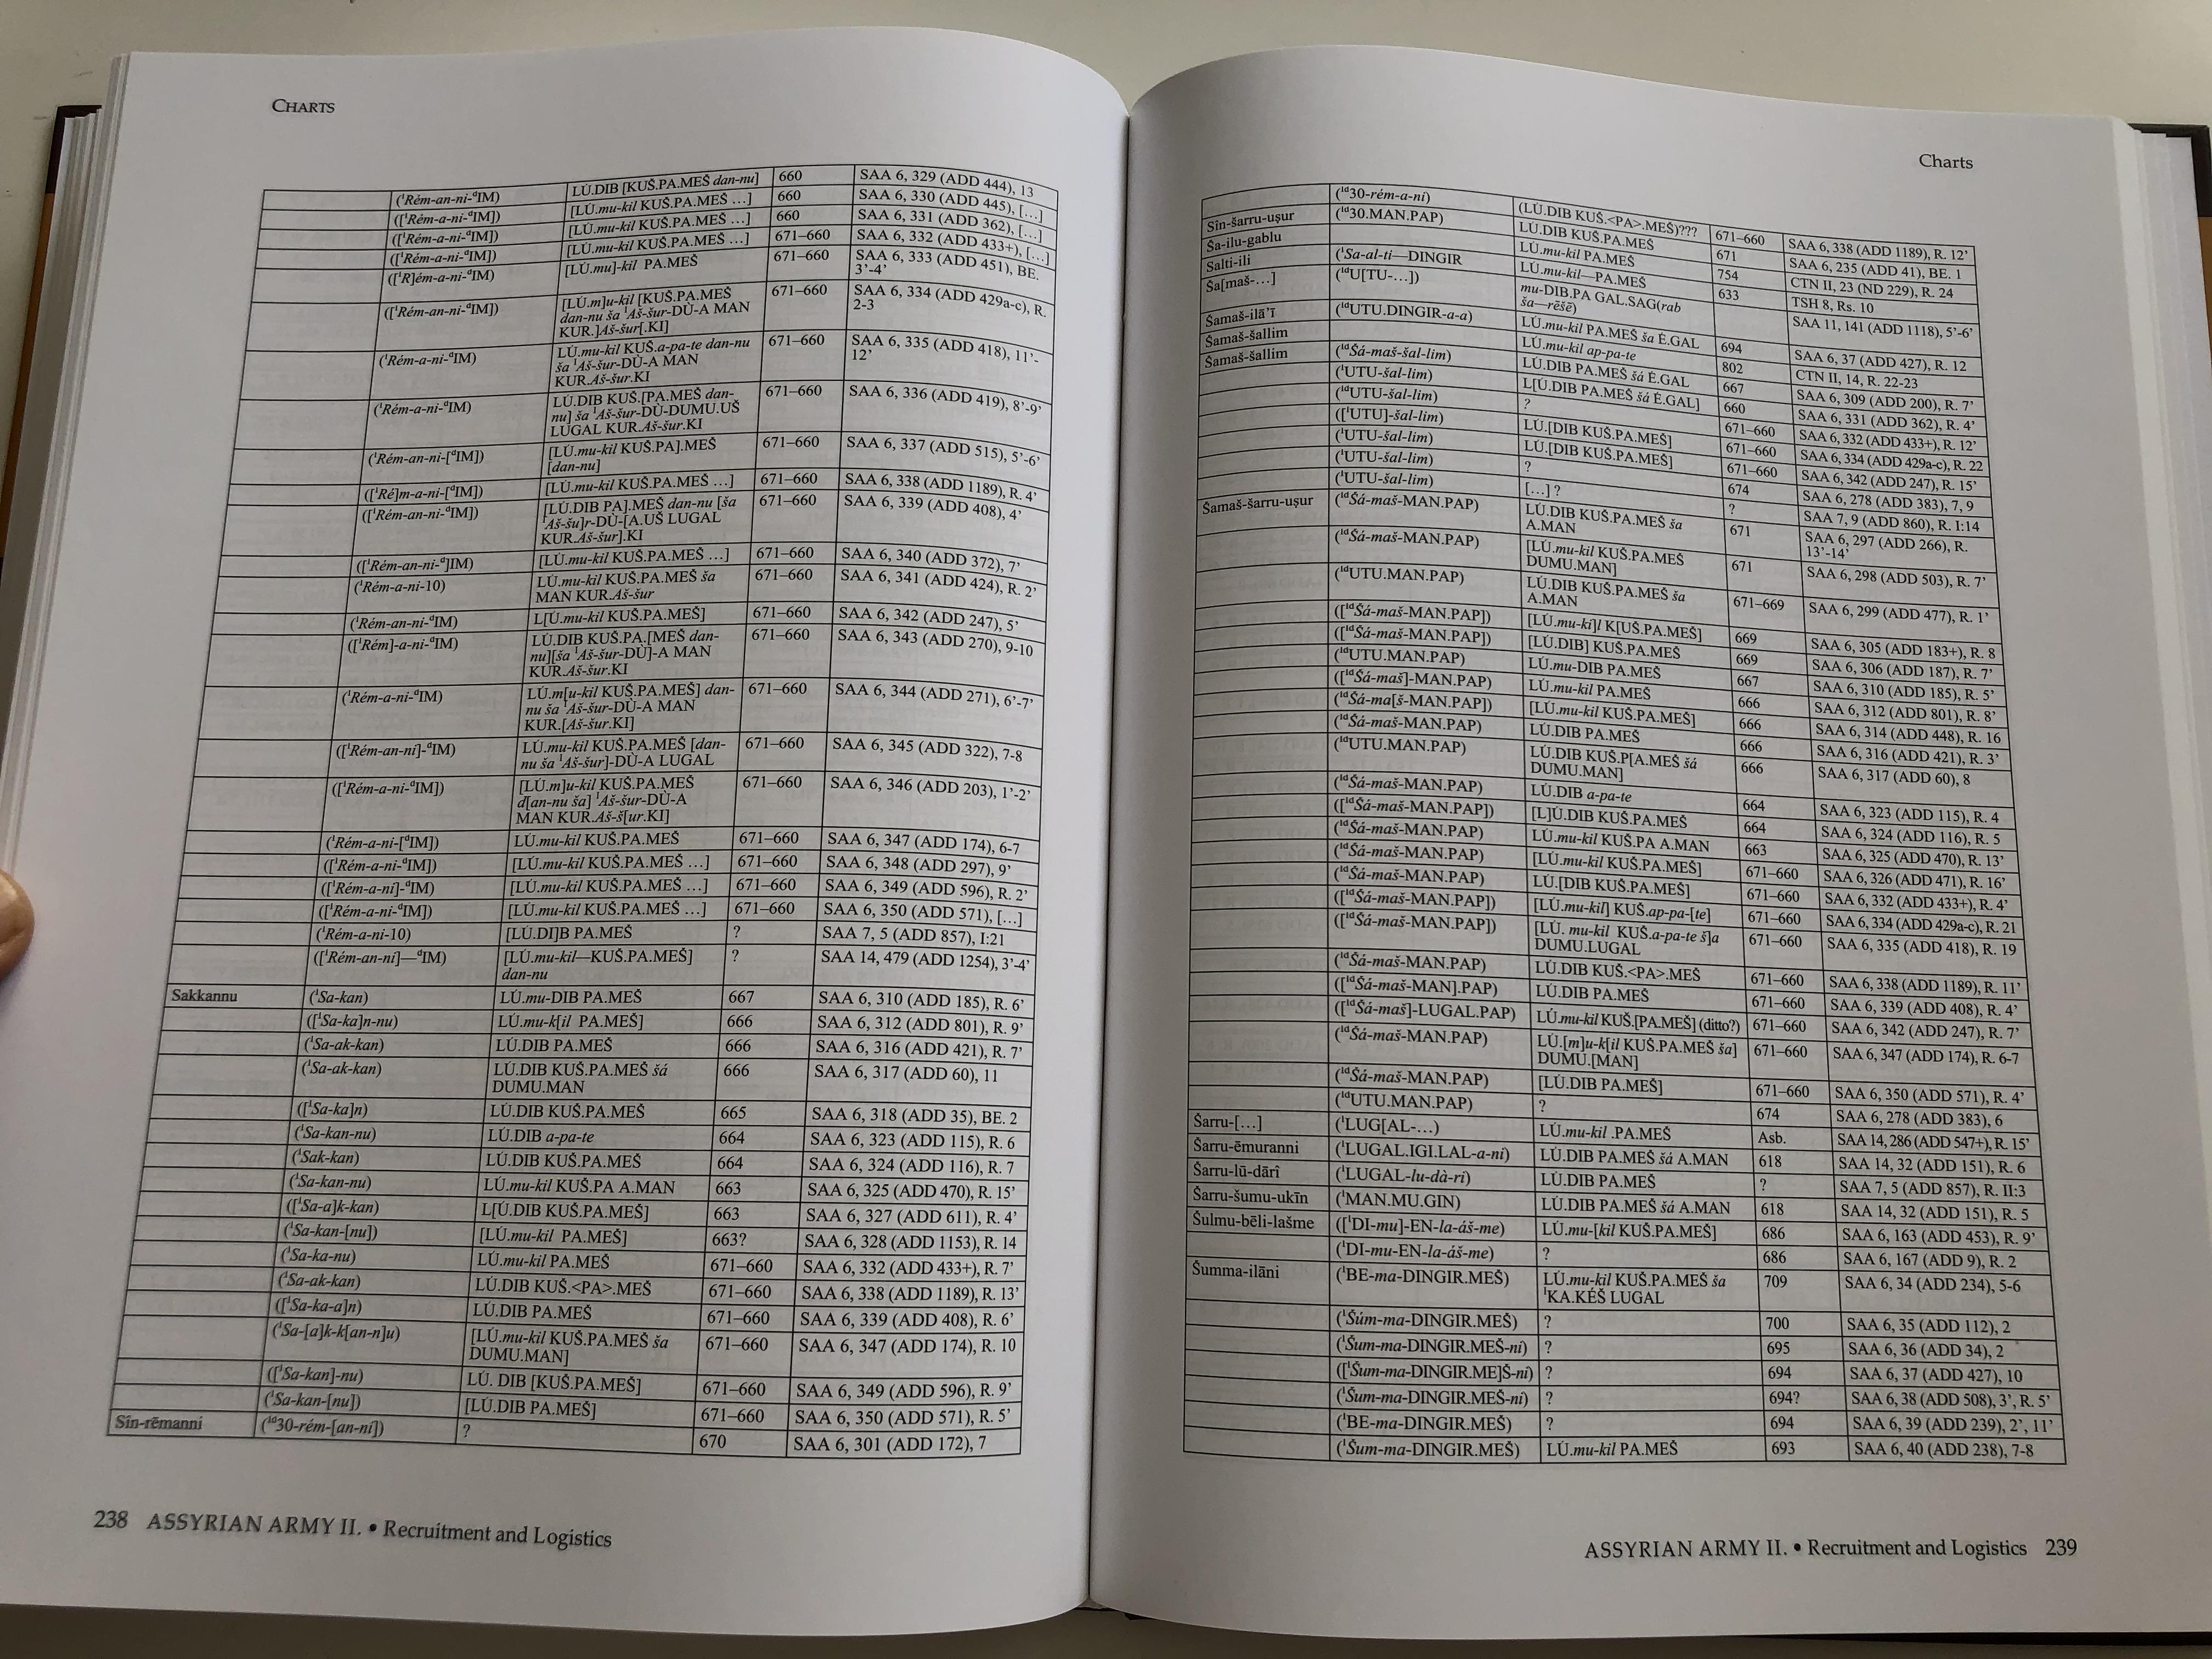 the-assyrian-army-ii-ii.-recruitment-and-logistics-author-dezs-tam-s-16.jpg